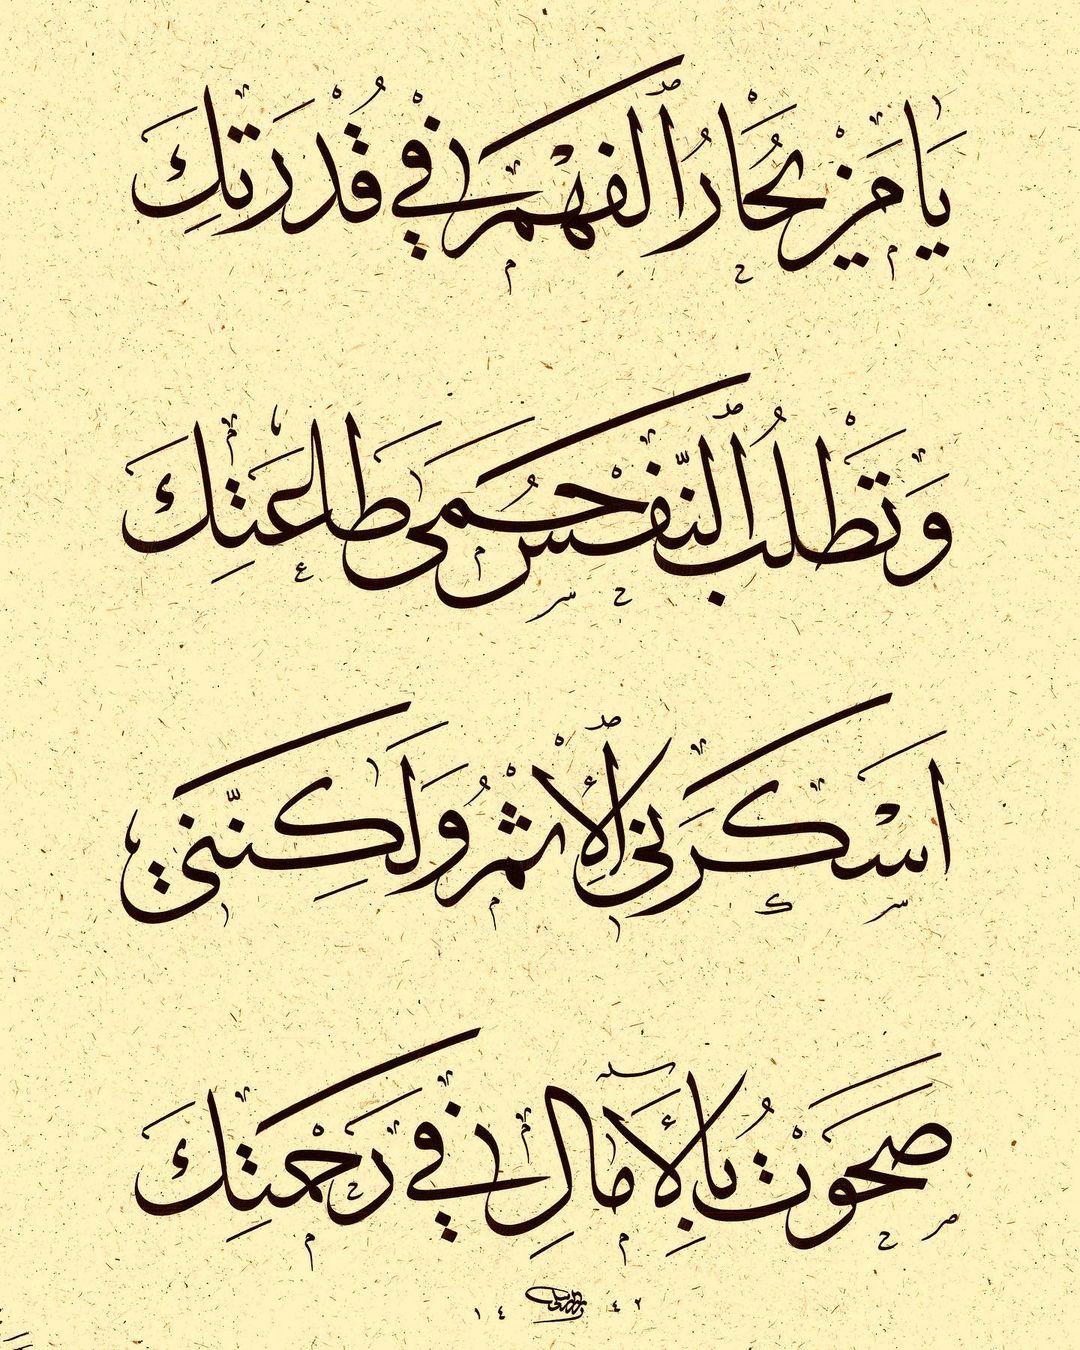 Professional Calligrapher Bijar Arbilly Calligraphy  رباعية اخري للحكيم عمر الخيام قيد التذهيب #calligraphy #kunst #art #tehran #ista… 520